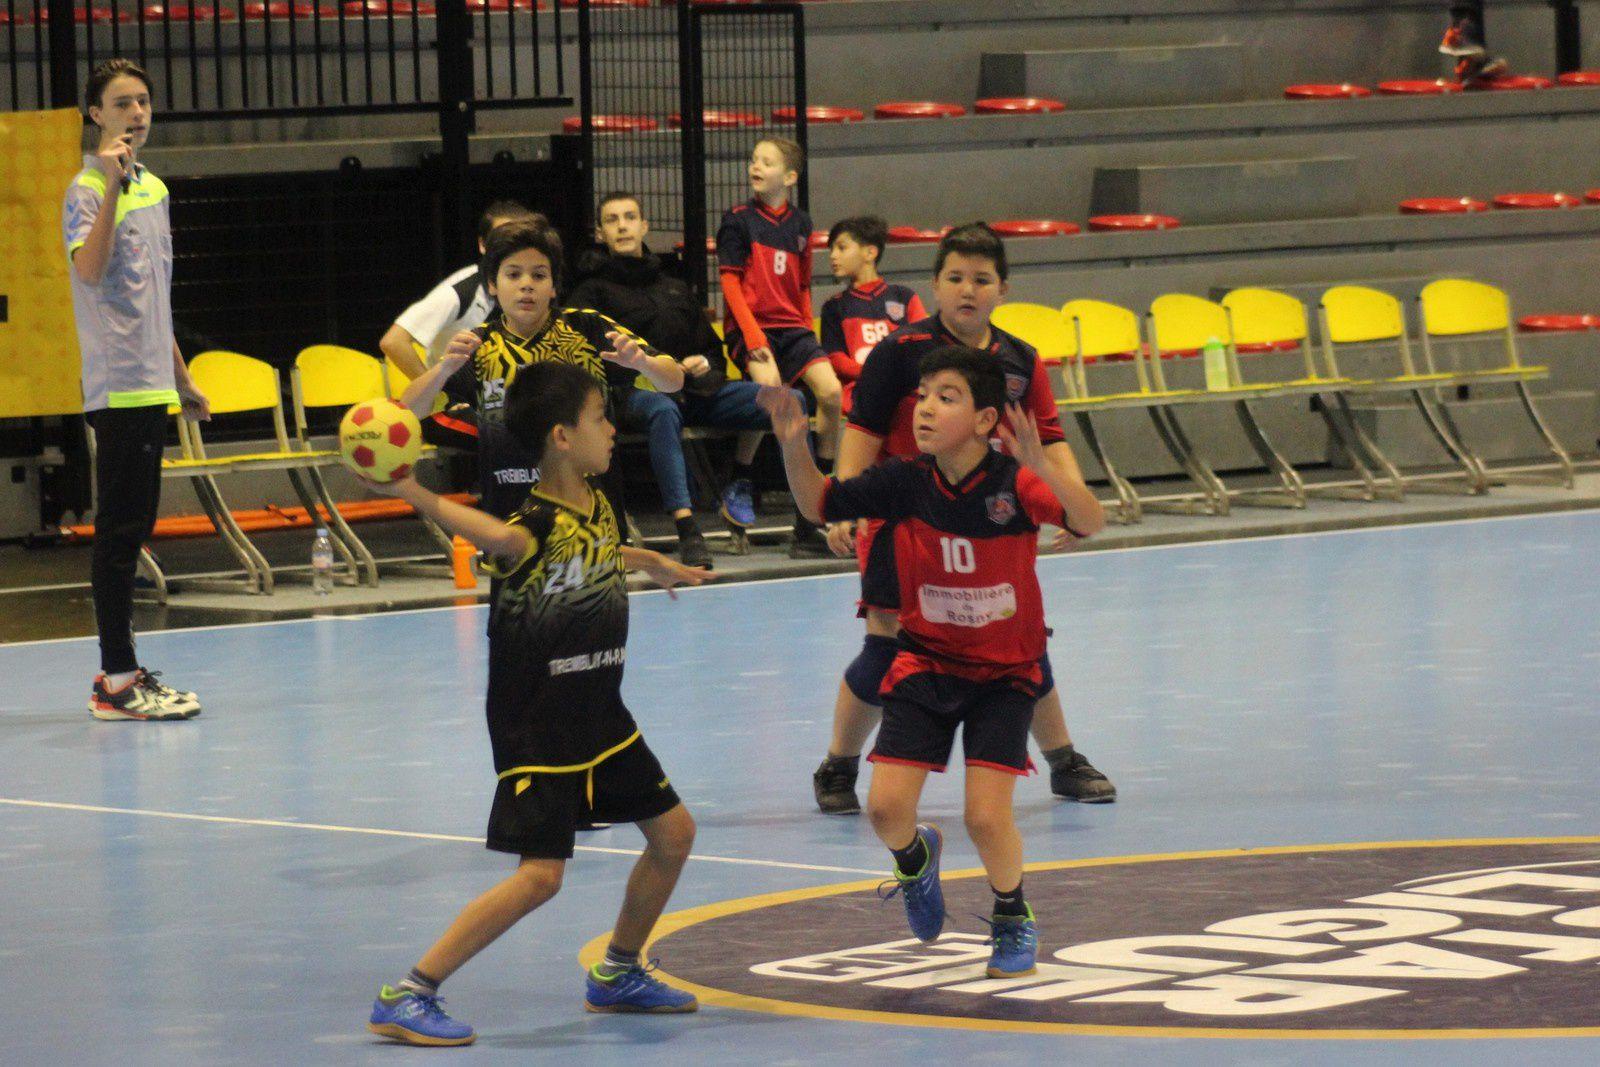 TREMBLAY vs SOR HB - 1ère Division 93 U11M (04.02.2018)